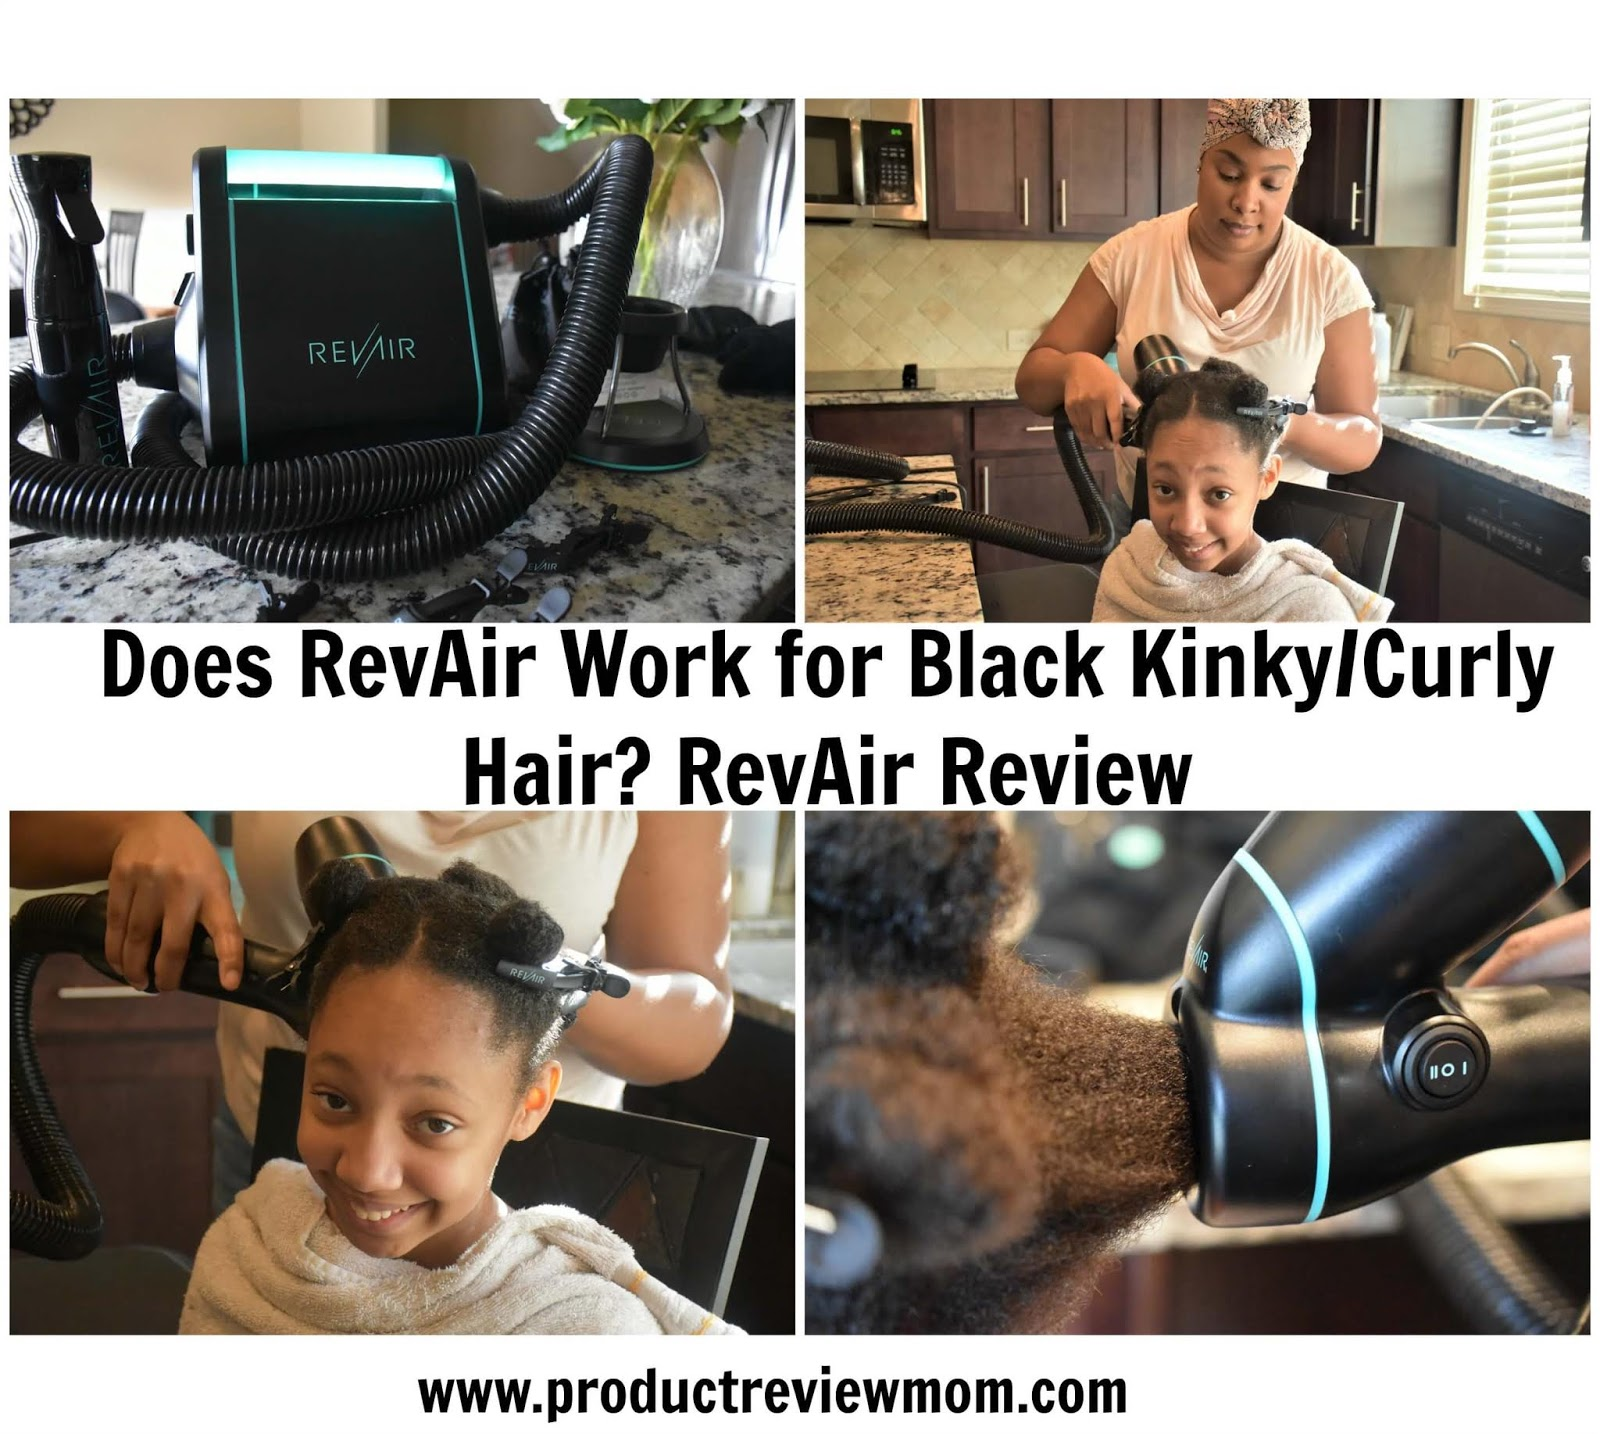 Video: Does RevAir Work for Black Kinky/Curly Hair? RevAir Review